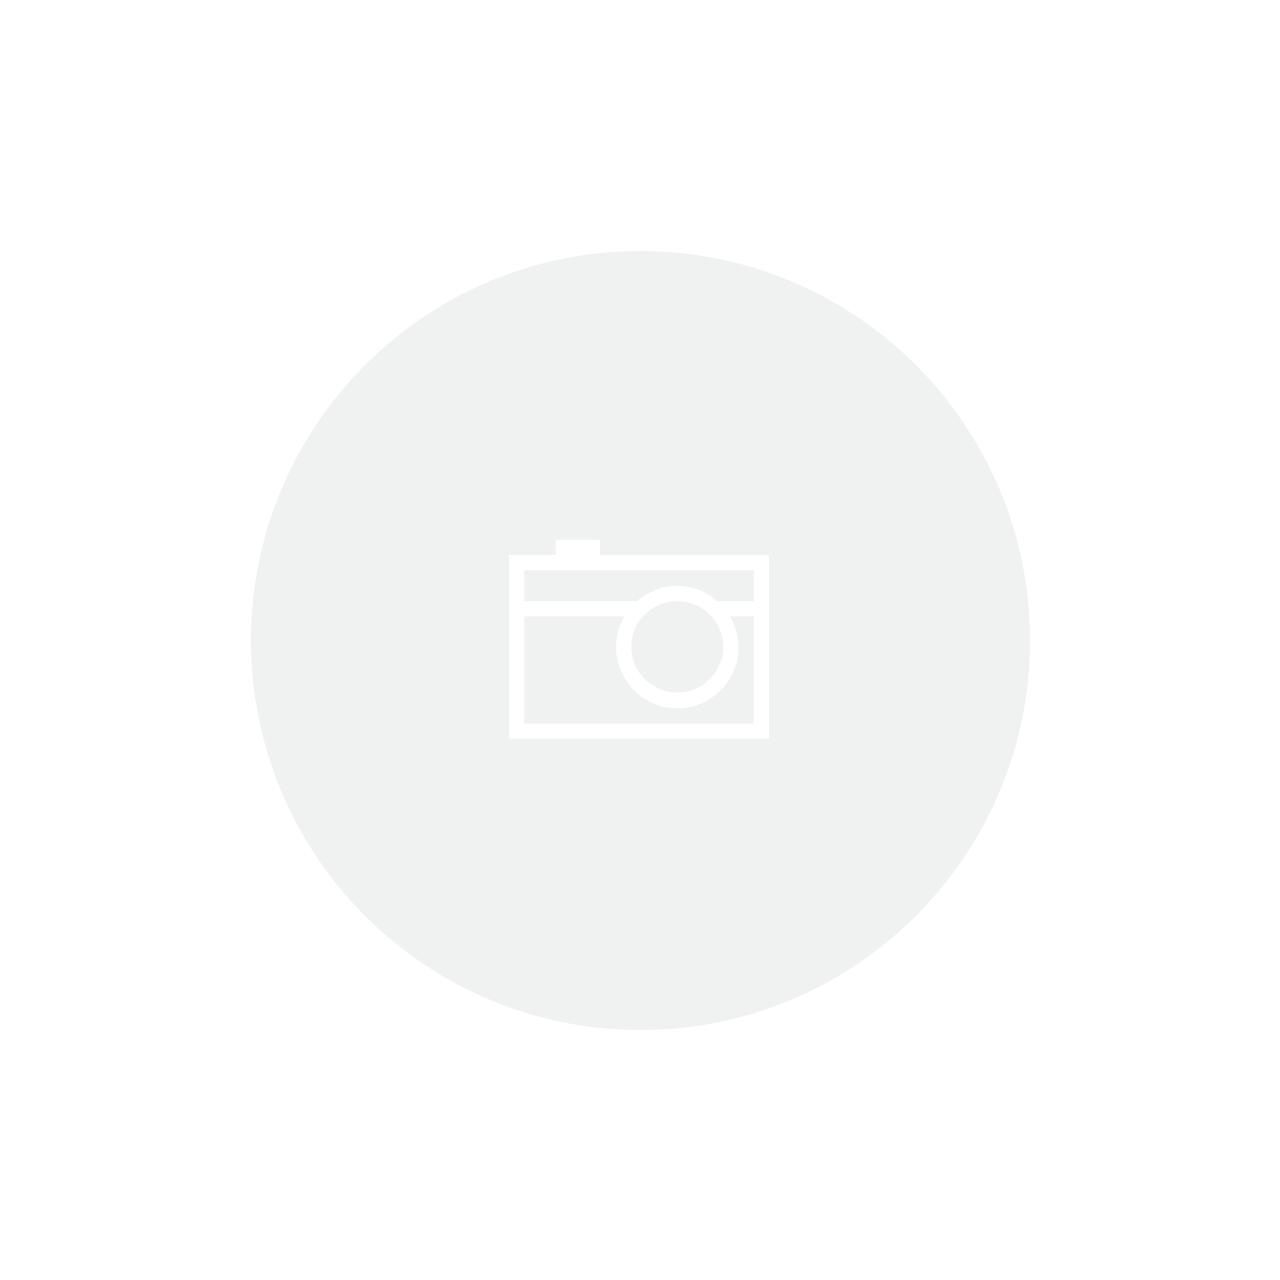 Placa de Vídeo VGA NVIDIA GIGABYTE GEFORCE GT 1030 2GB GDDR5 Low Profile GV-N1030D5-2GL